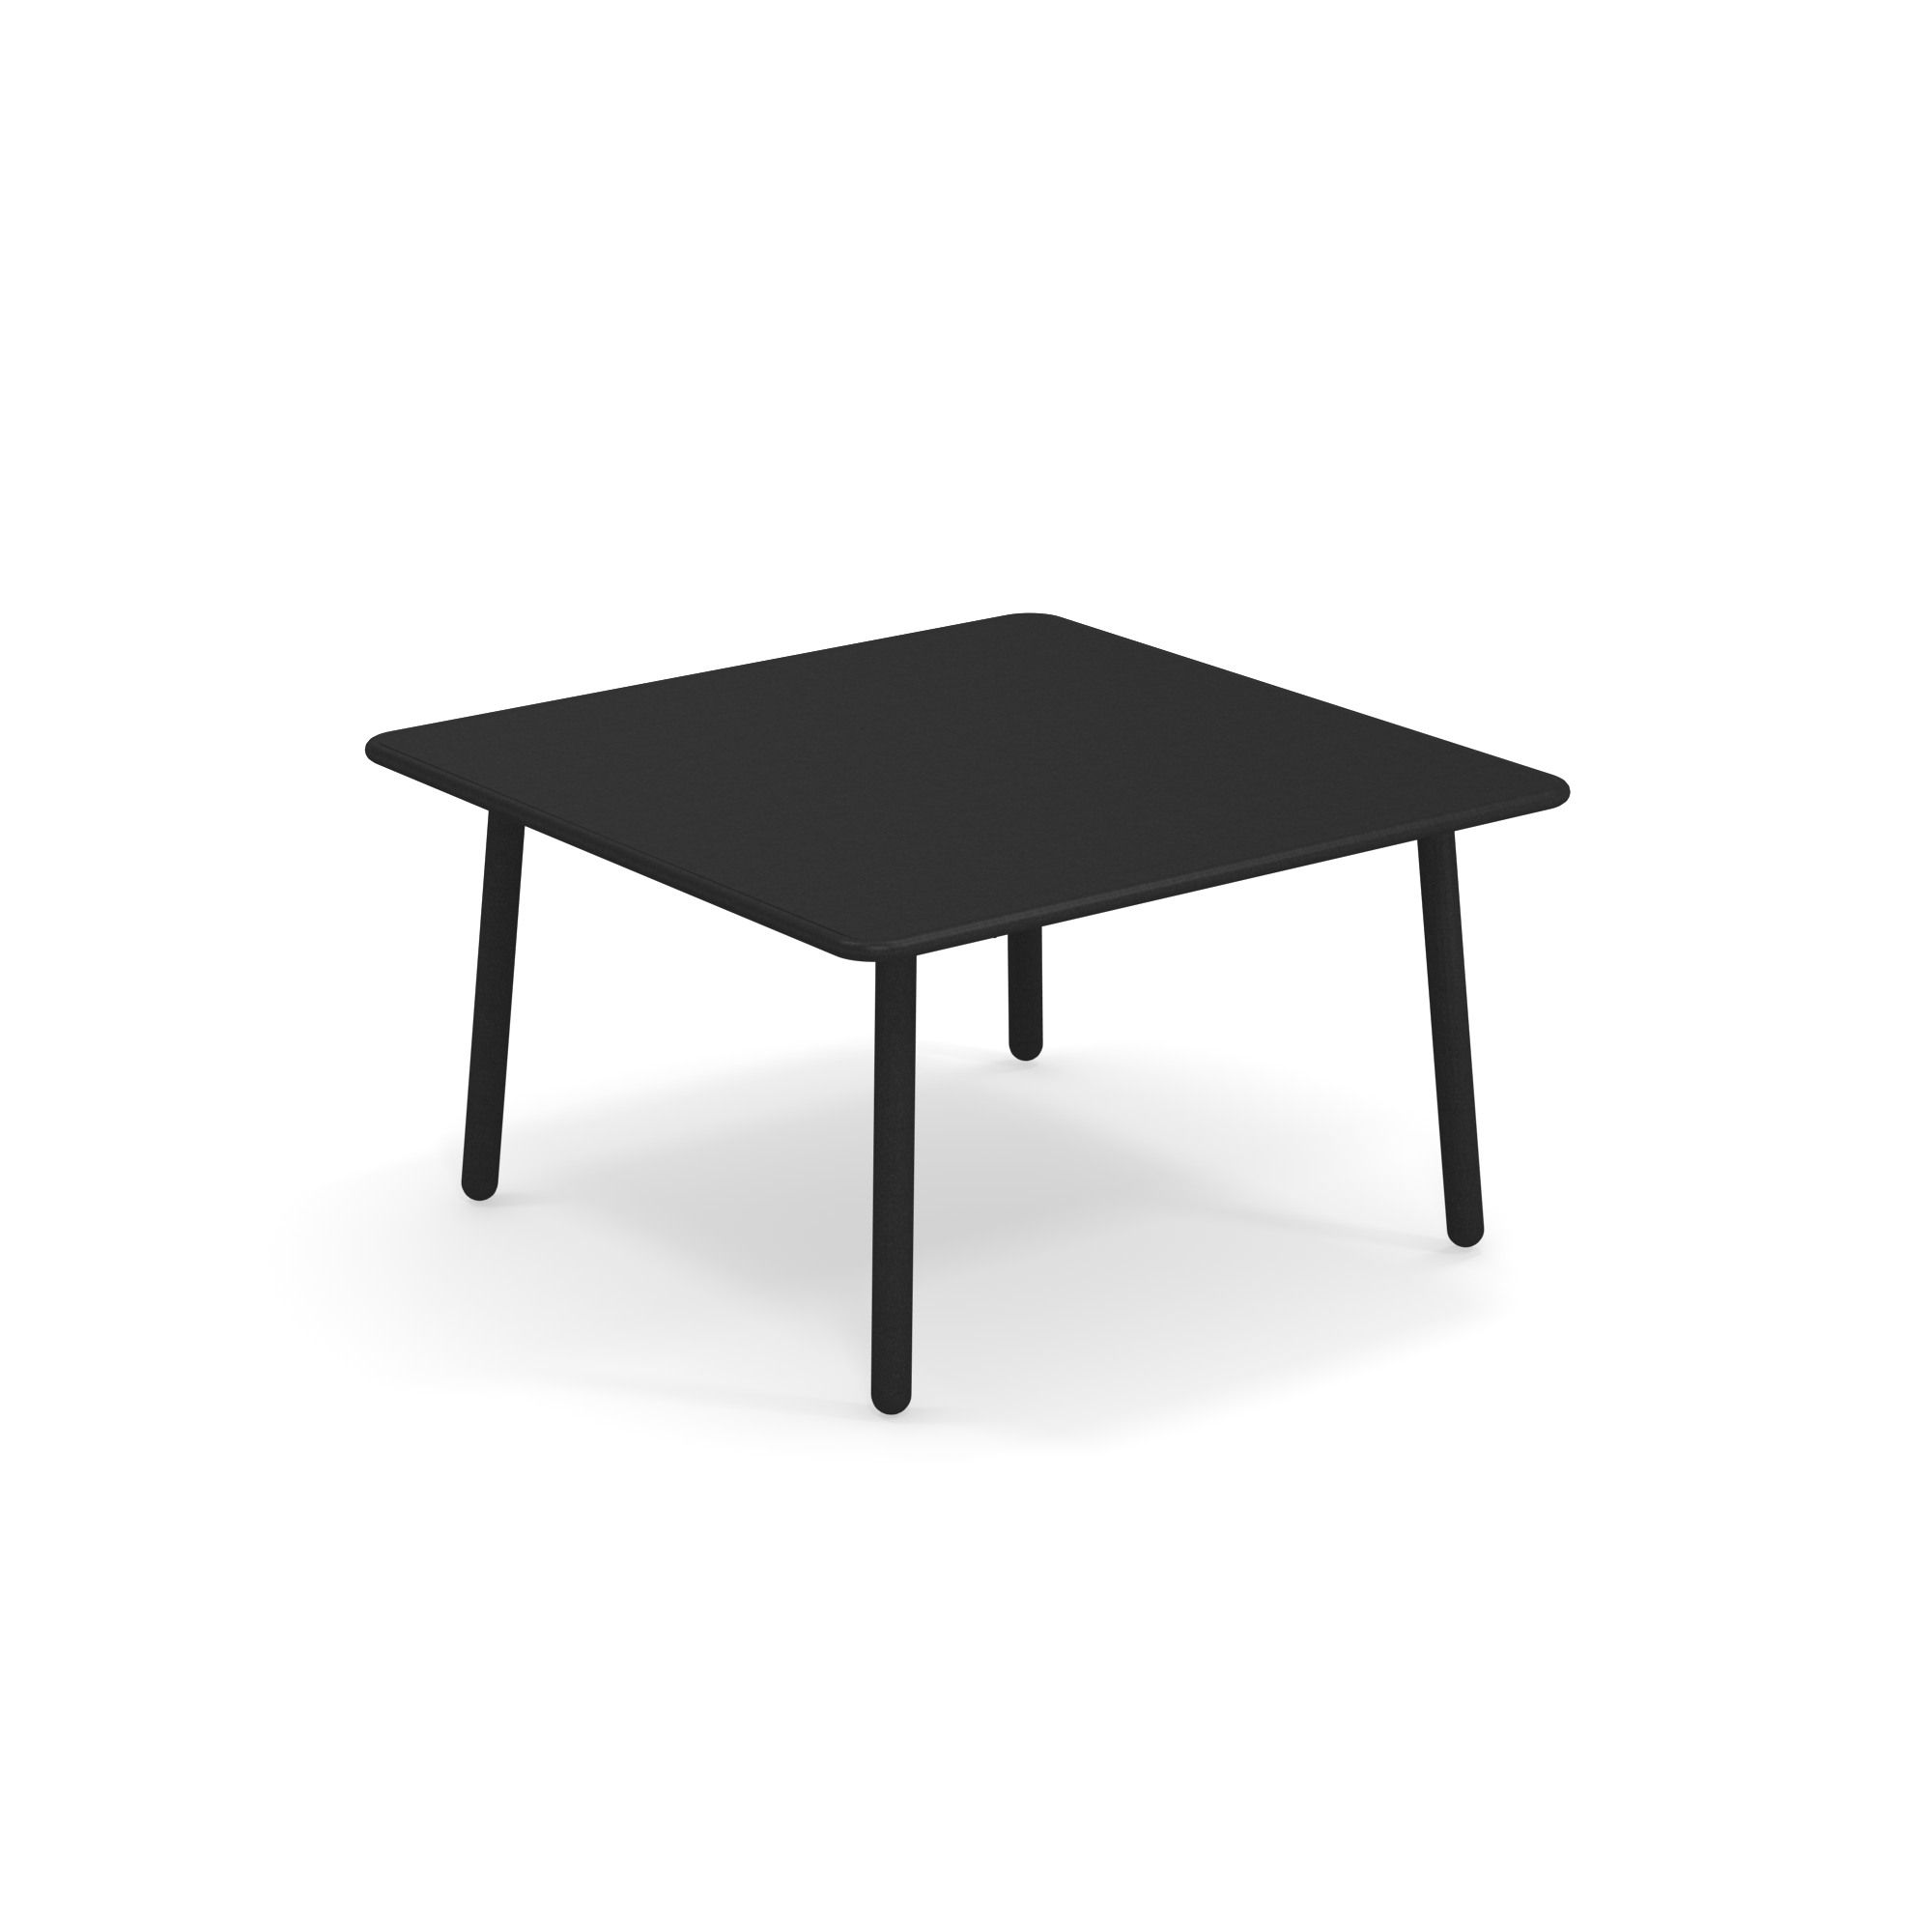 emuamericas, llc 526-24 low table, outdoor